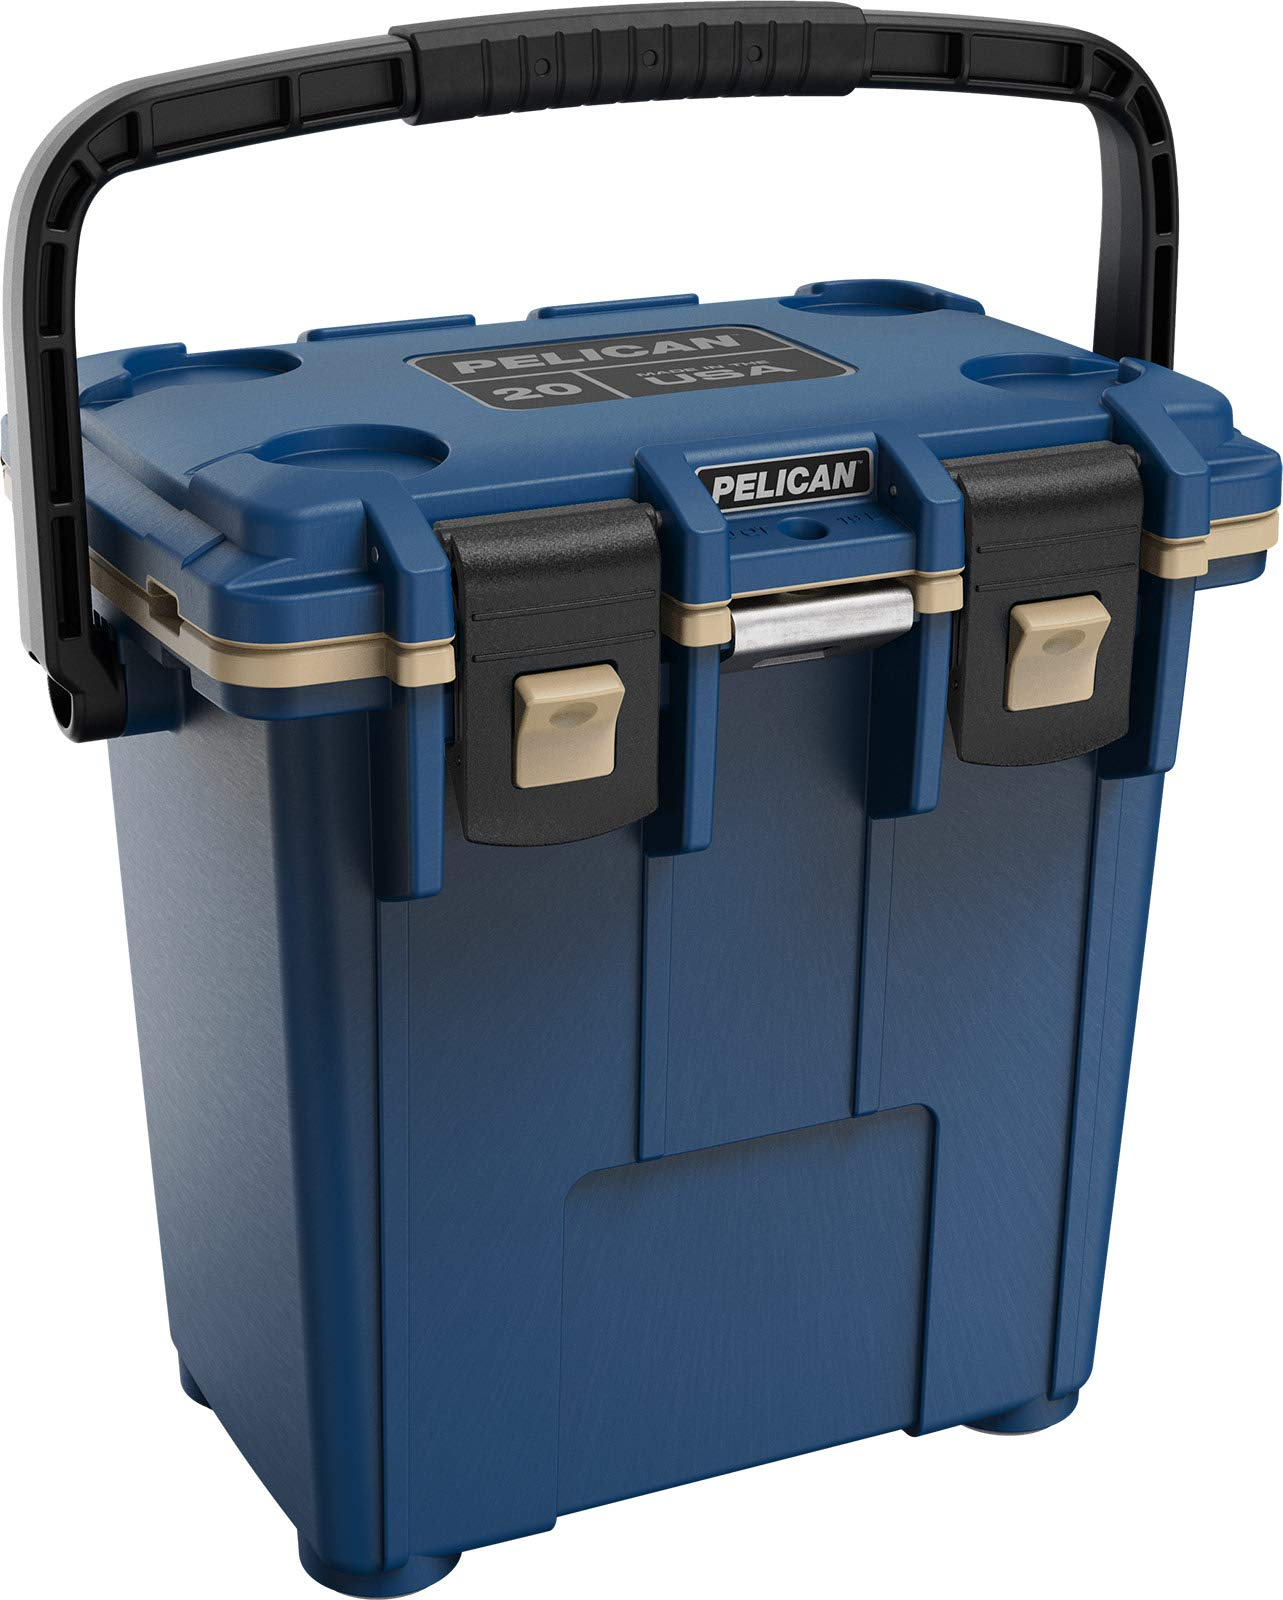 Pelican Elite 20 Quart Cooler (Pacific Blue/Coyote)